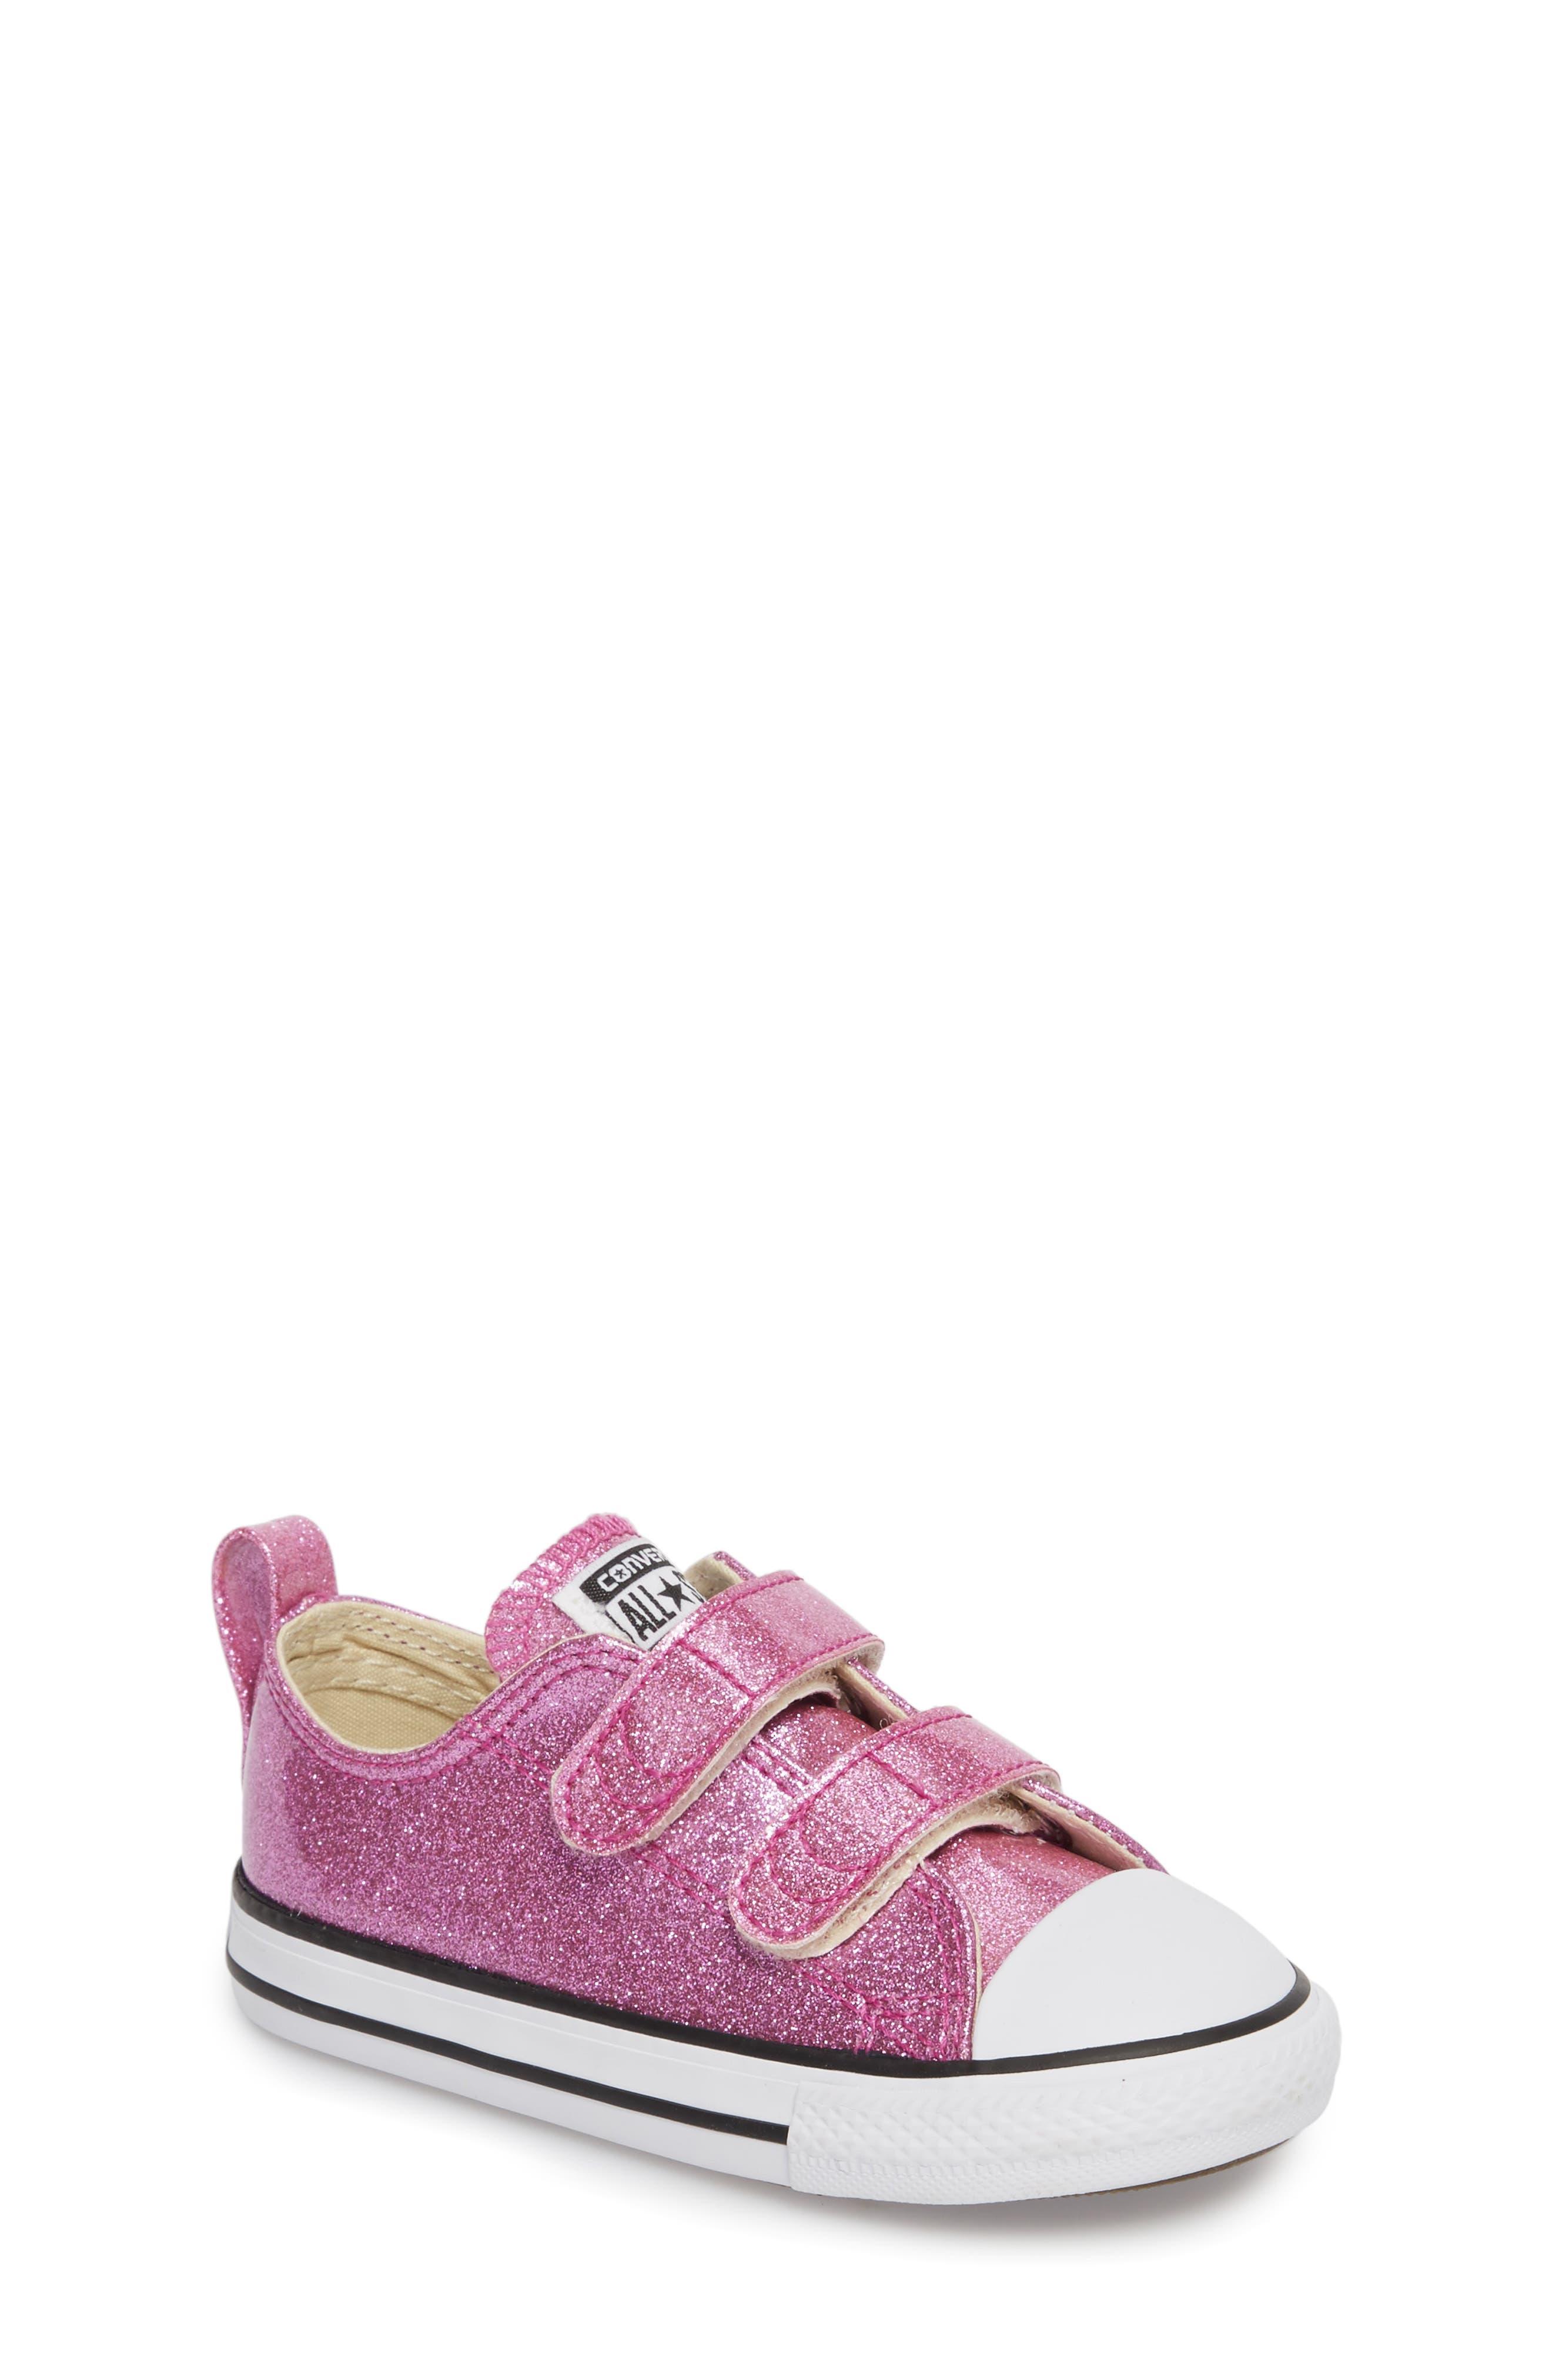 Converse All Star® Seasonal Glitter Sneaker (Baby, Walker & Toddler)